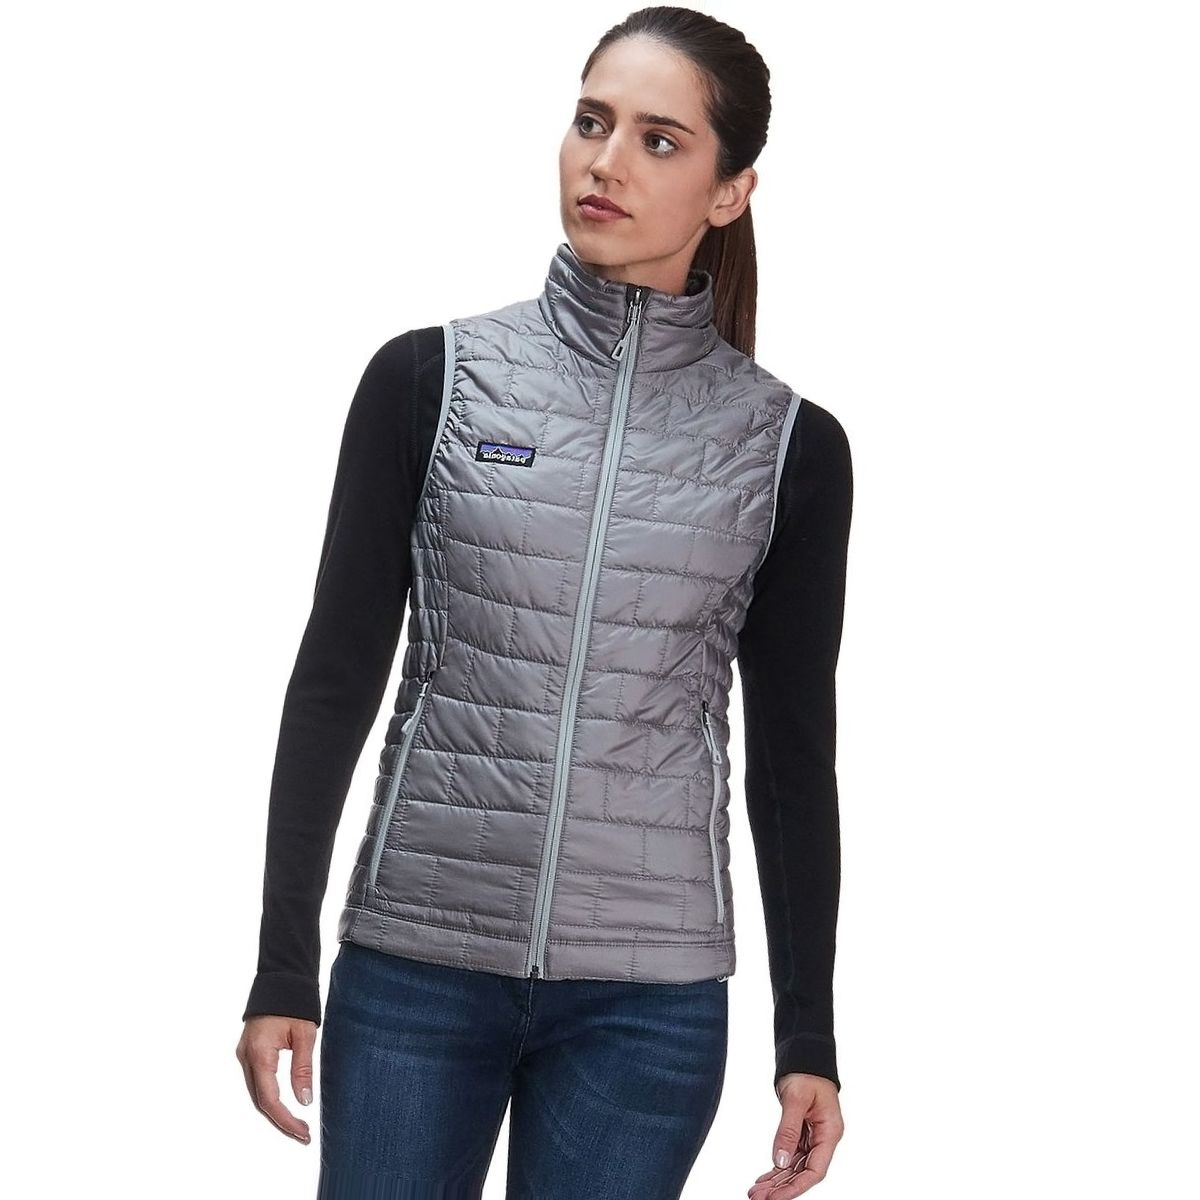 Patagonia Nano Puff Insulated Vest - Women's